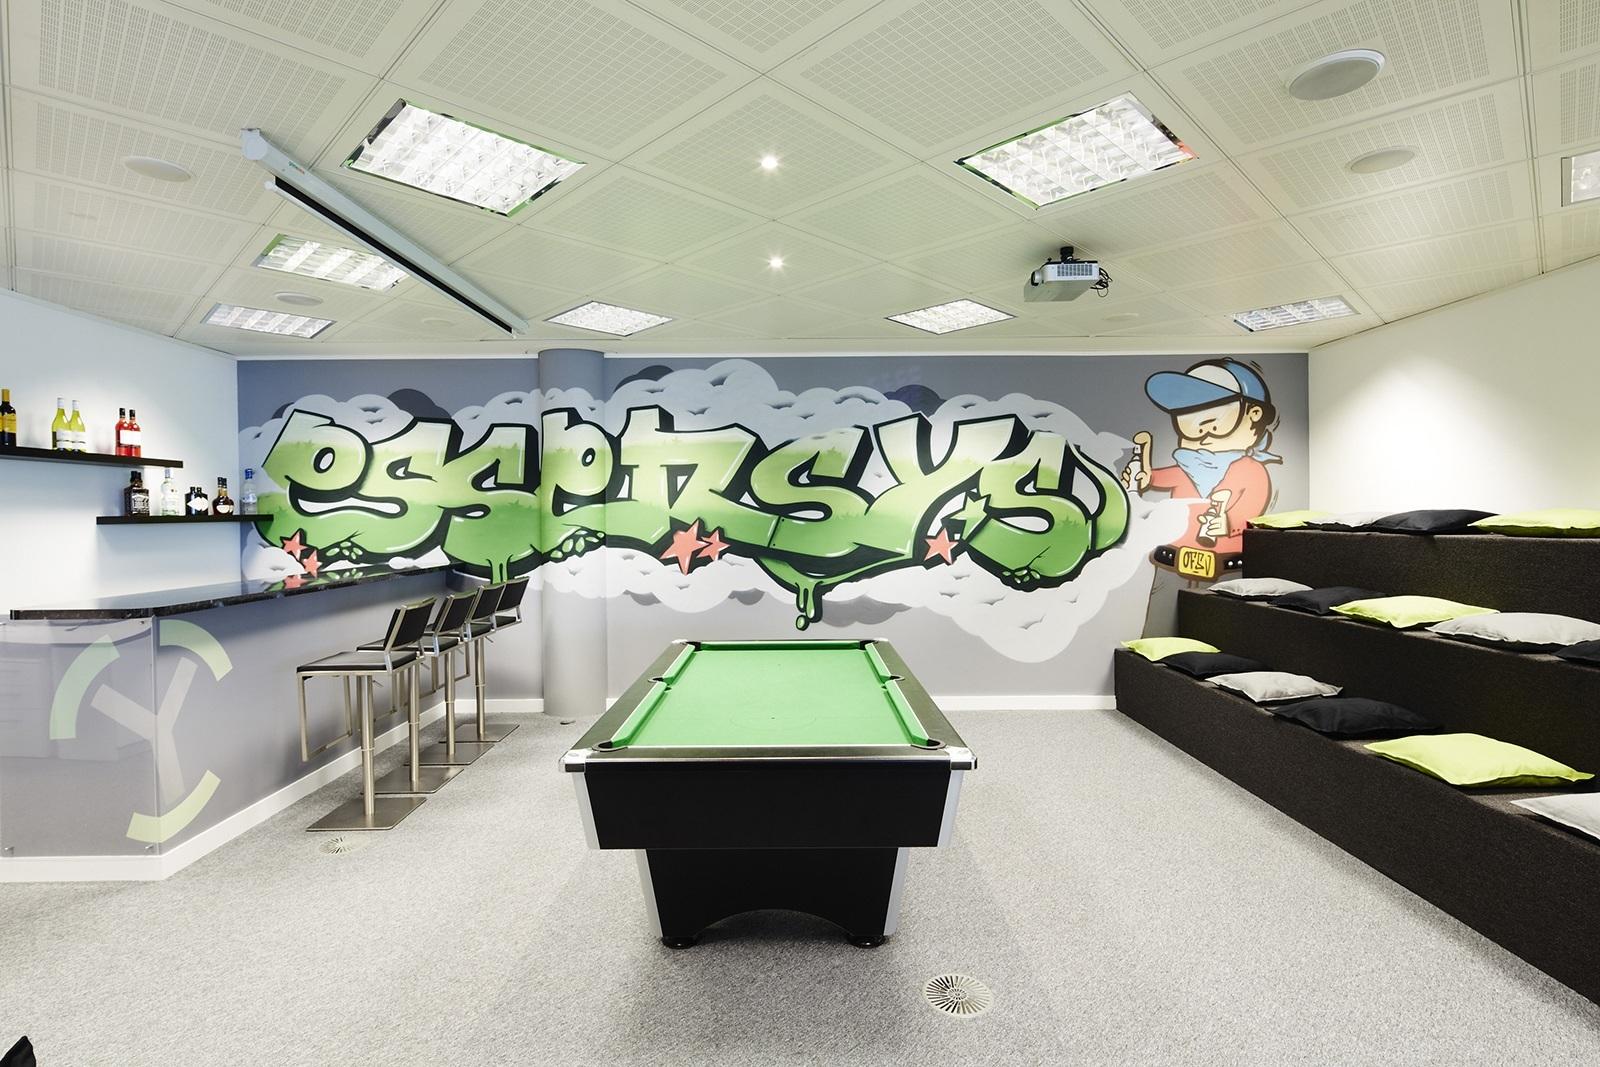 essensys-london-office-5